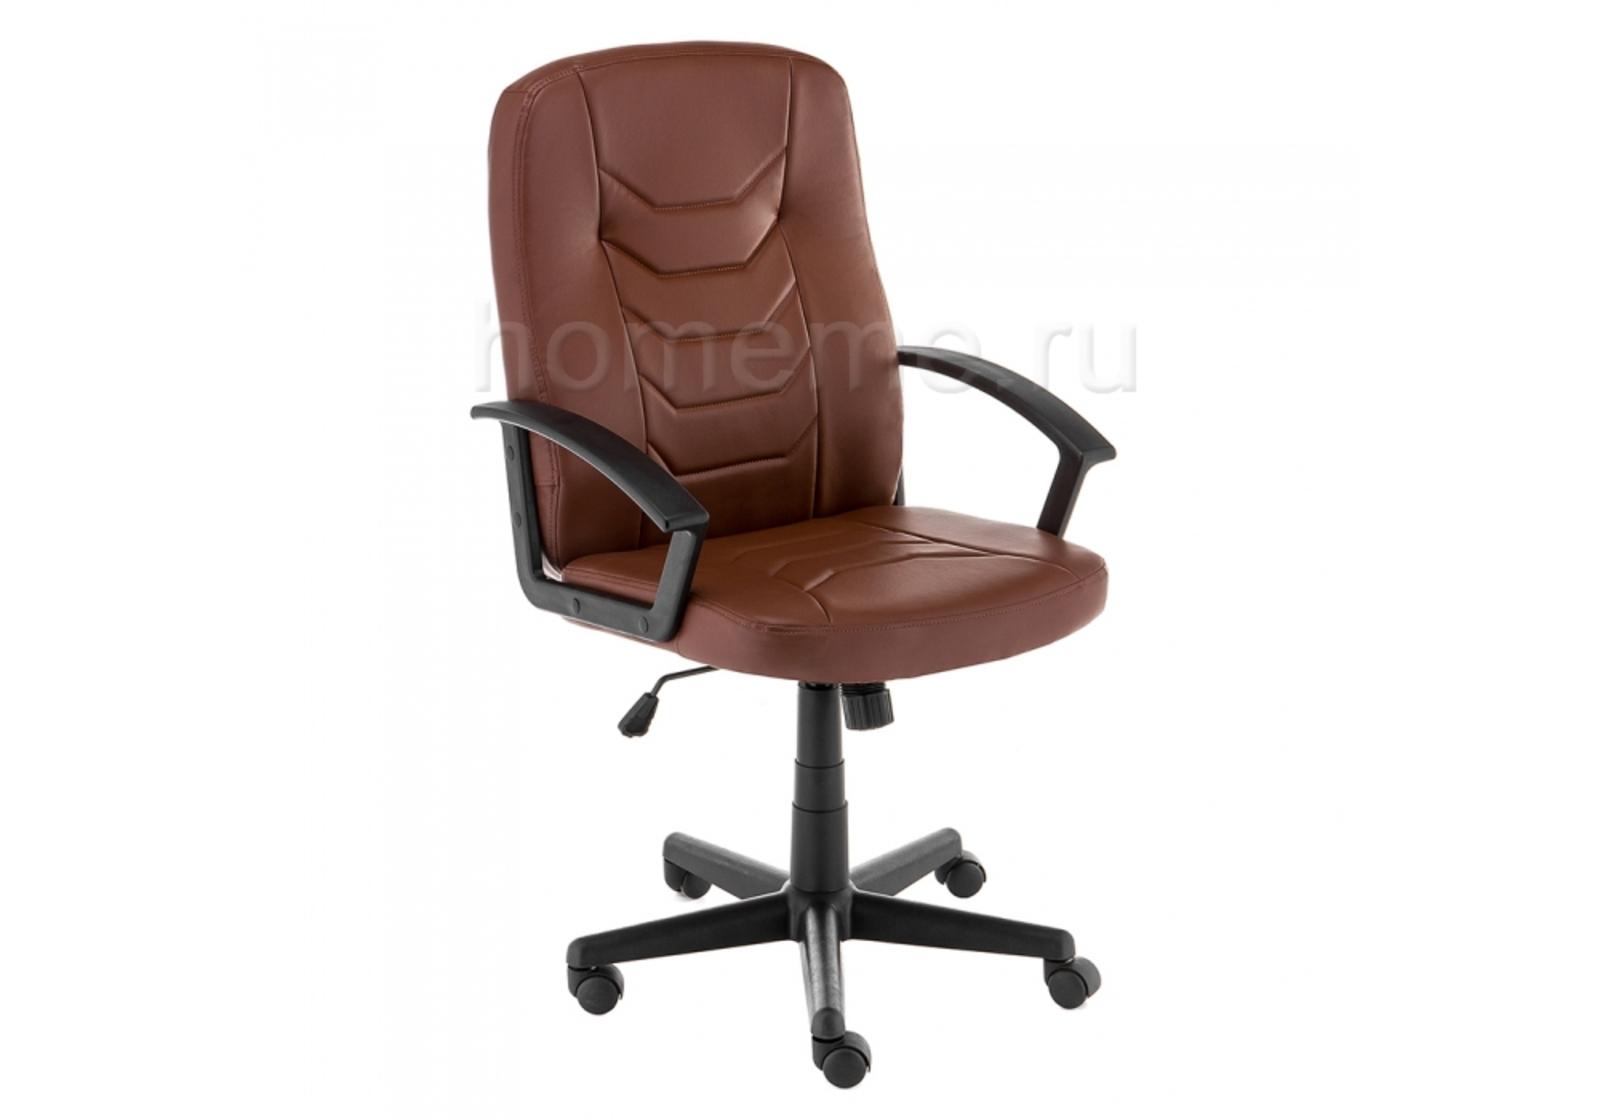 Кресло для офиса HomeMe Darin coffee 11269 от Homeme.ru